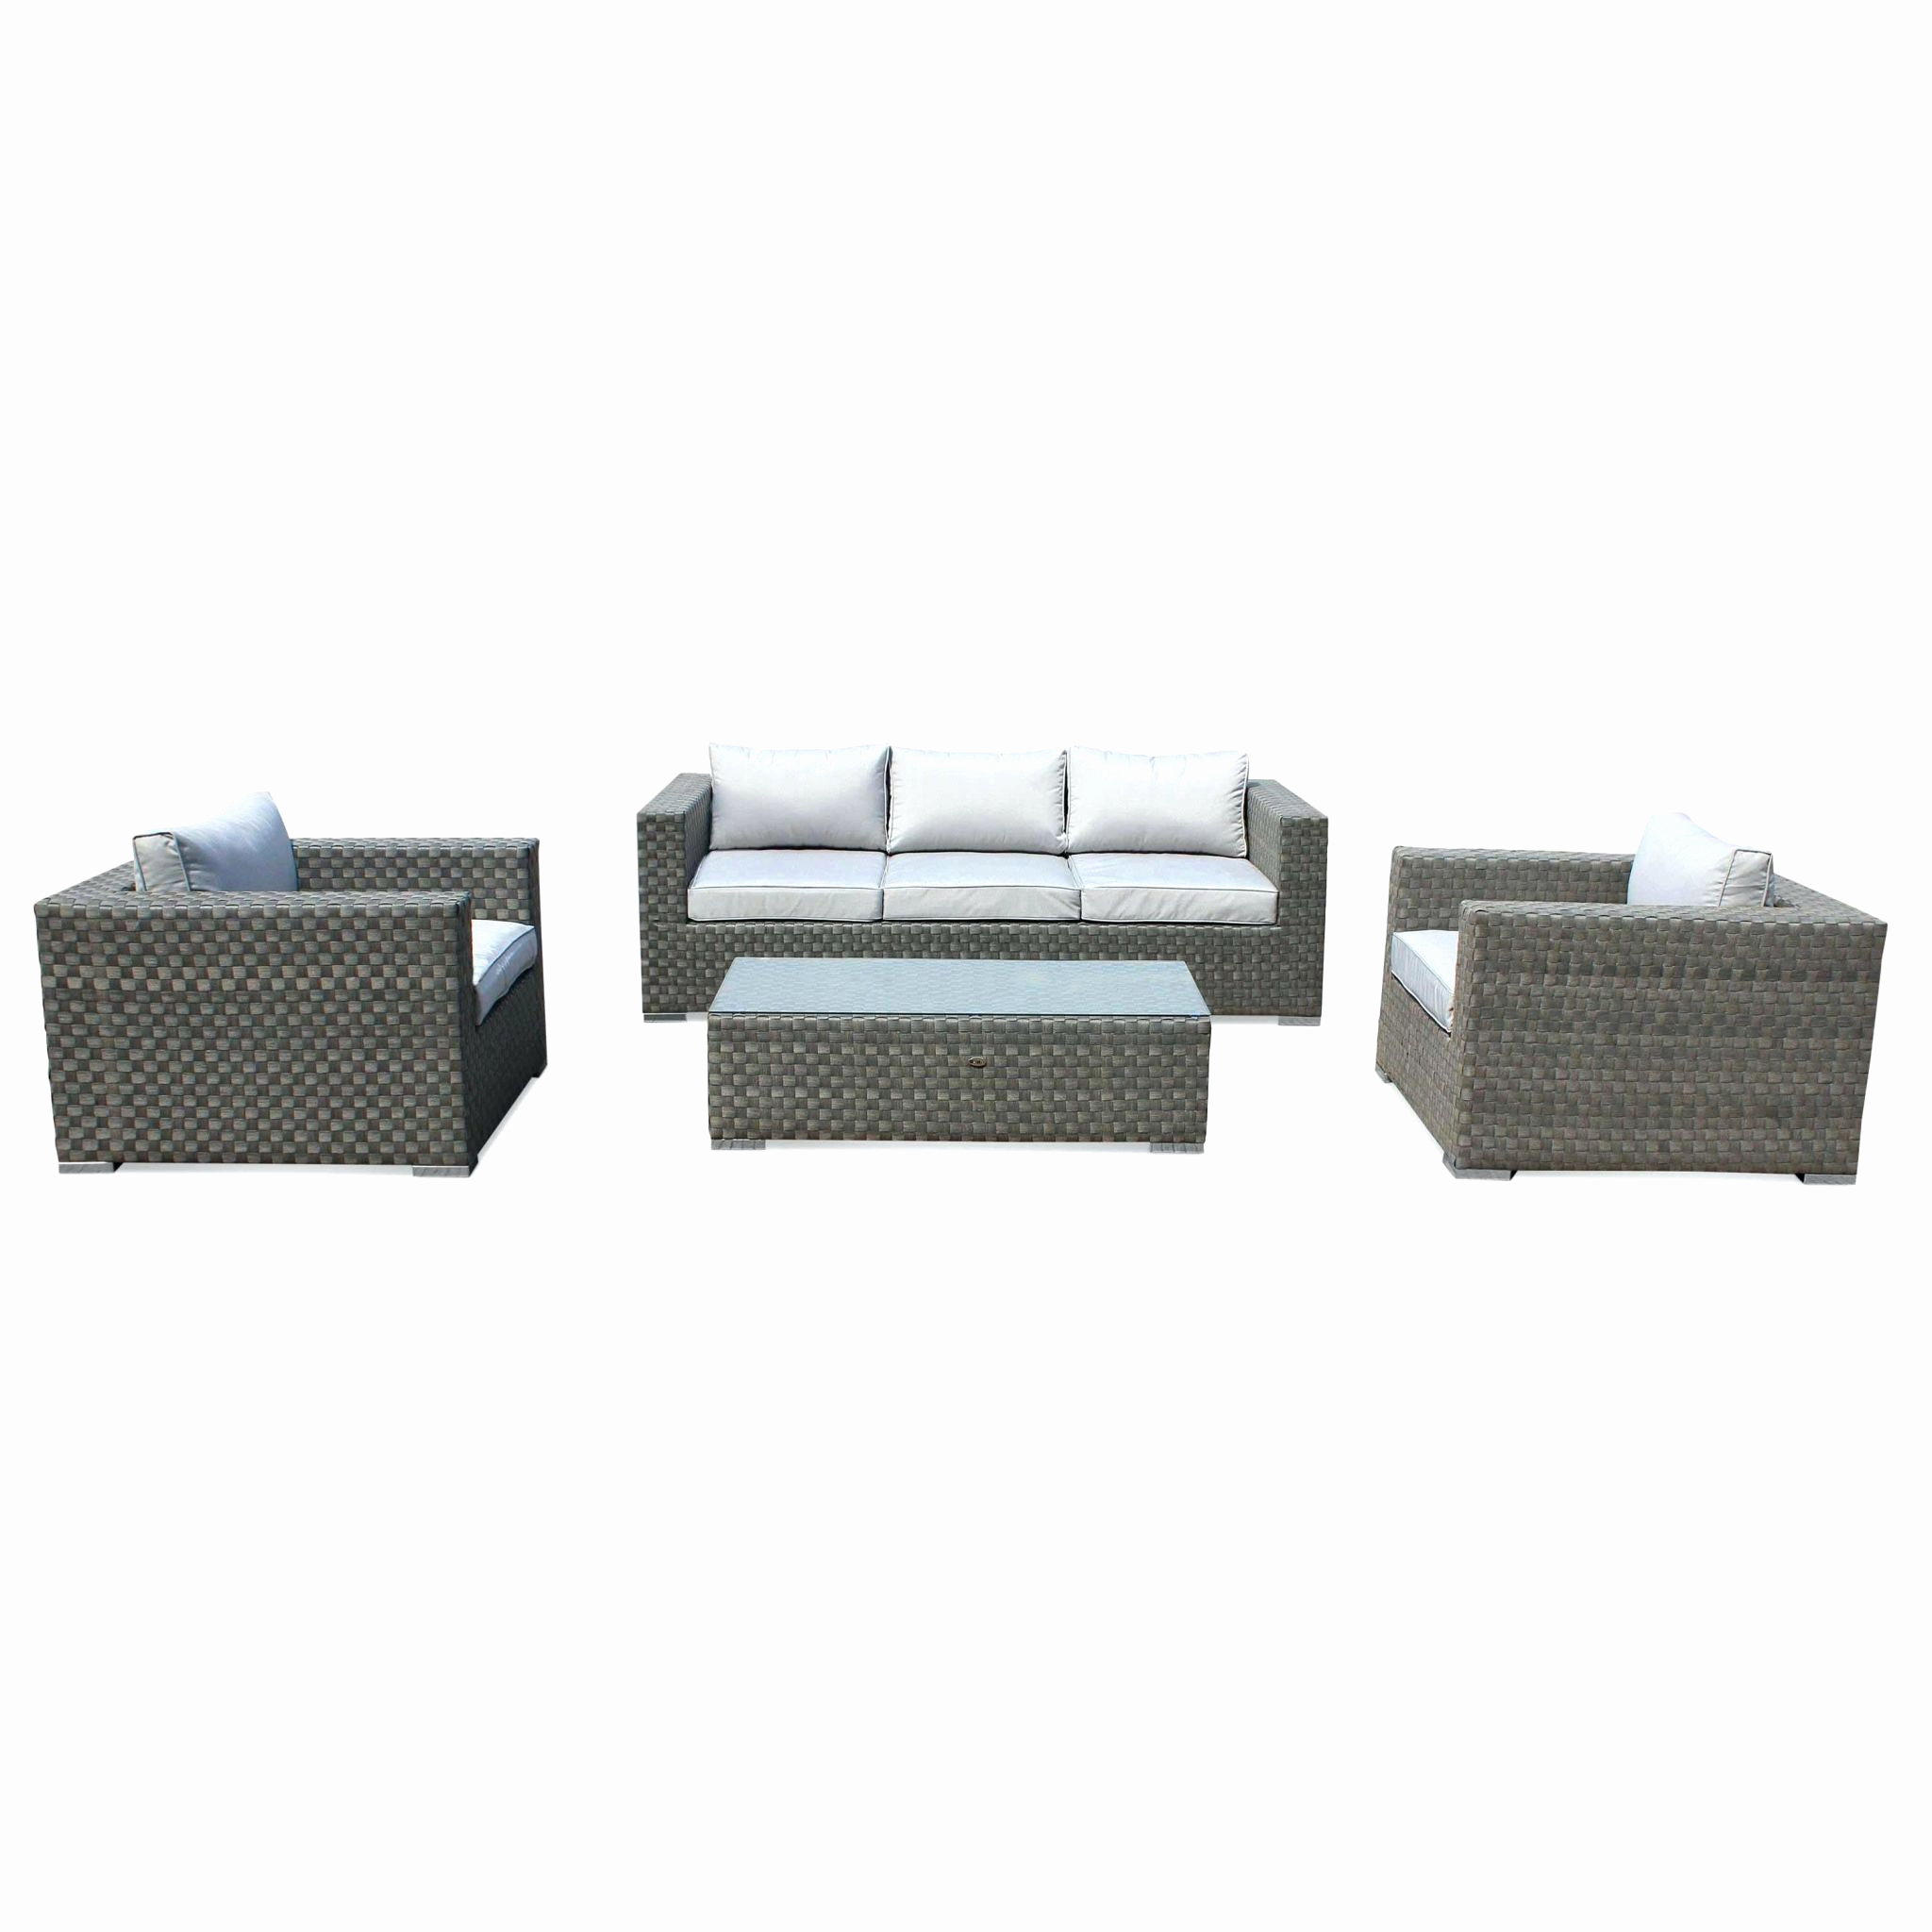 balancelle de jardin leclerc luxe transat de jardin leclerc aussi table et chaise de jardin leclerc of balancelle de jardin leclerc